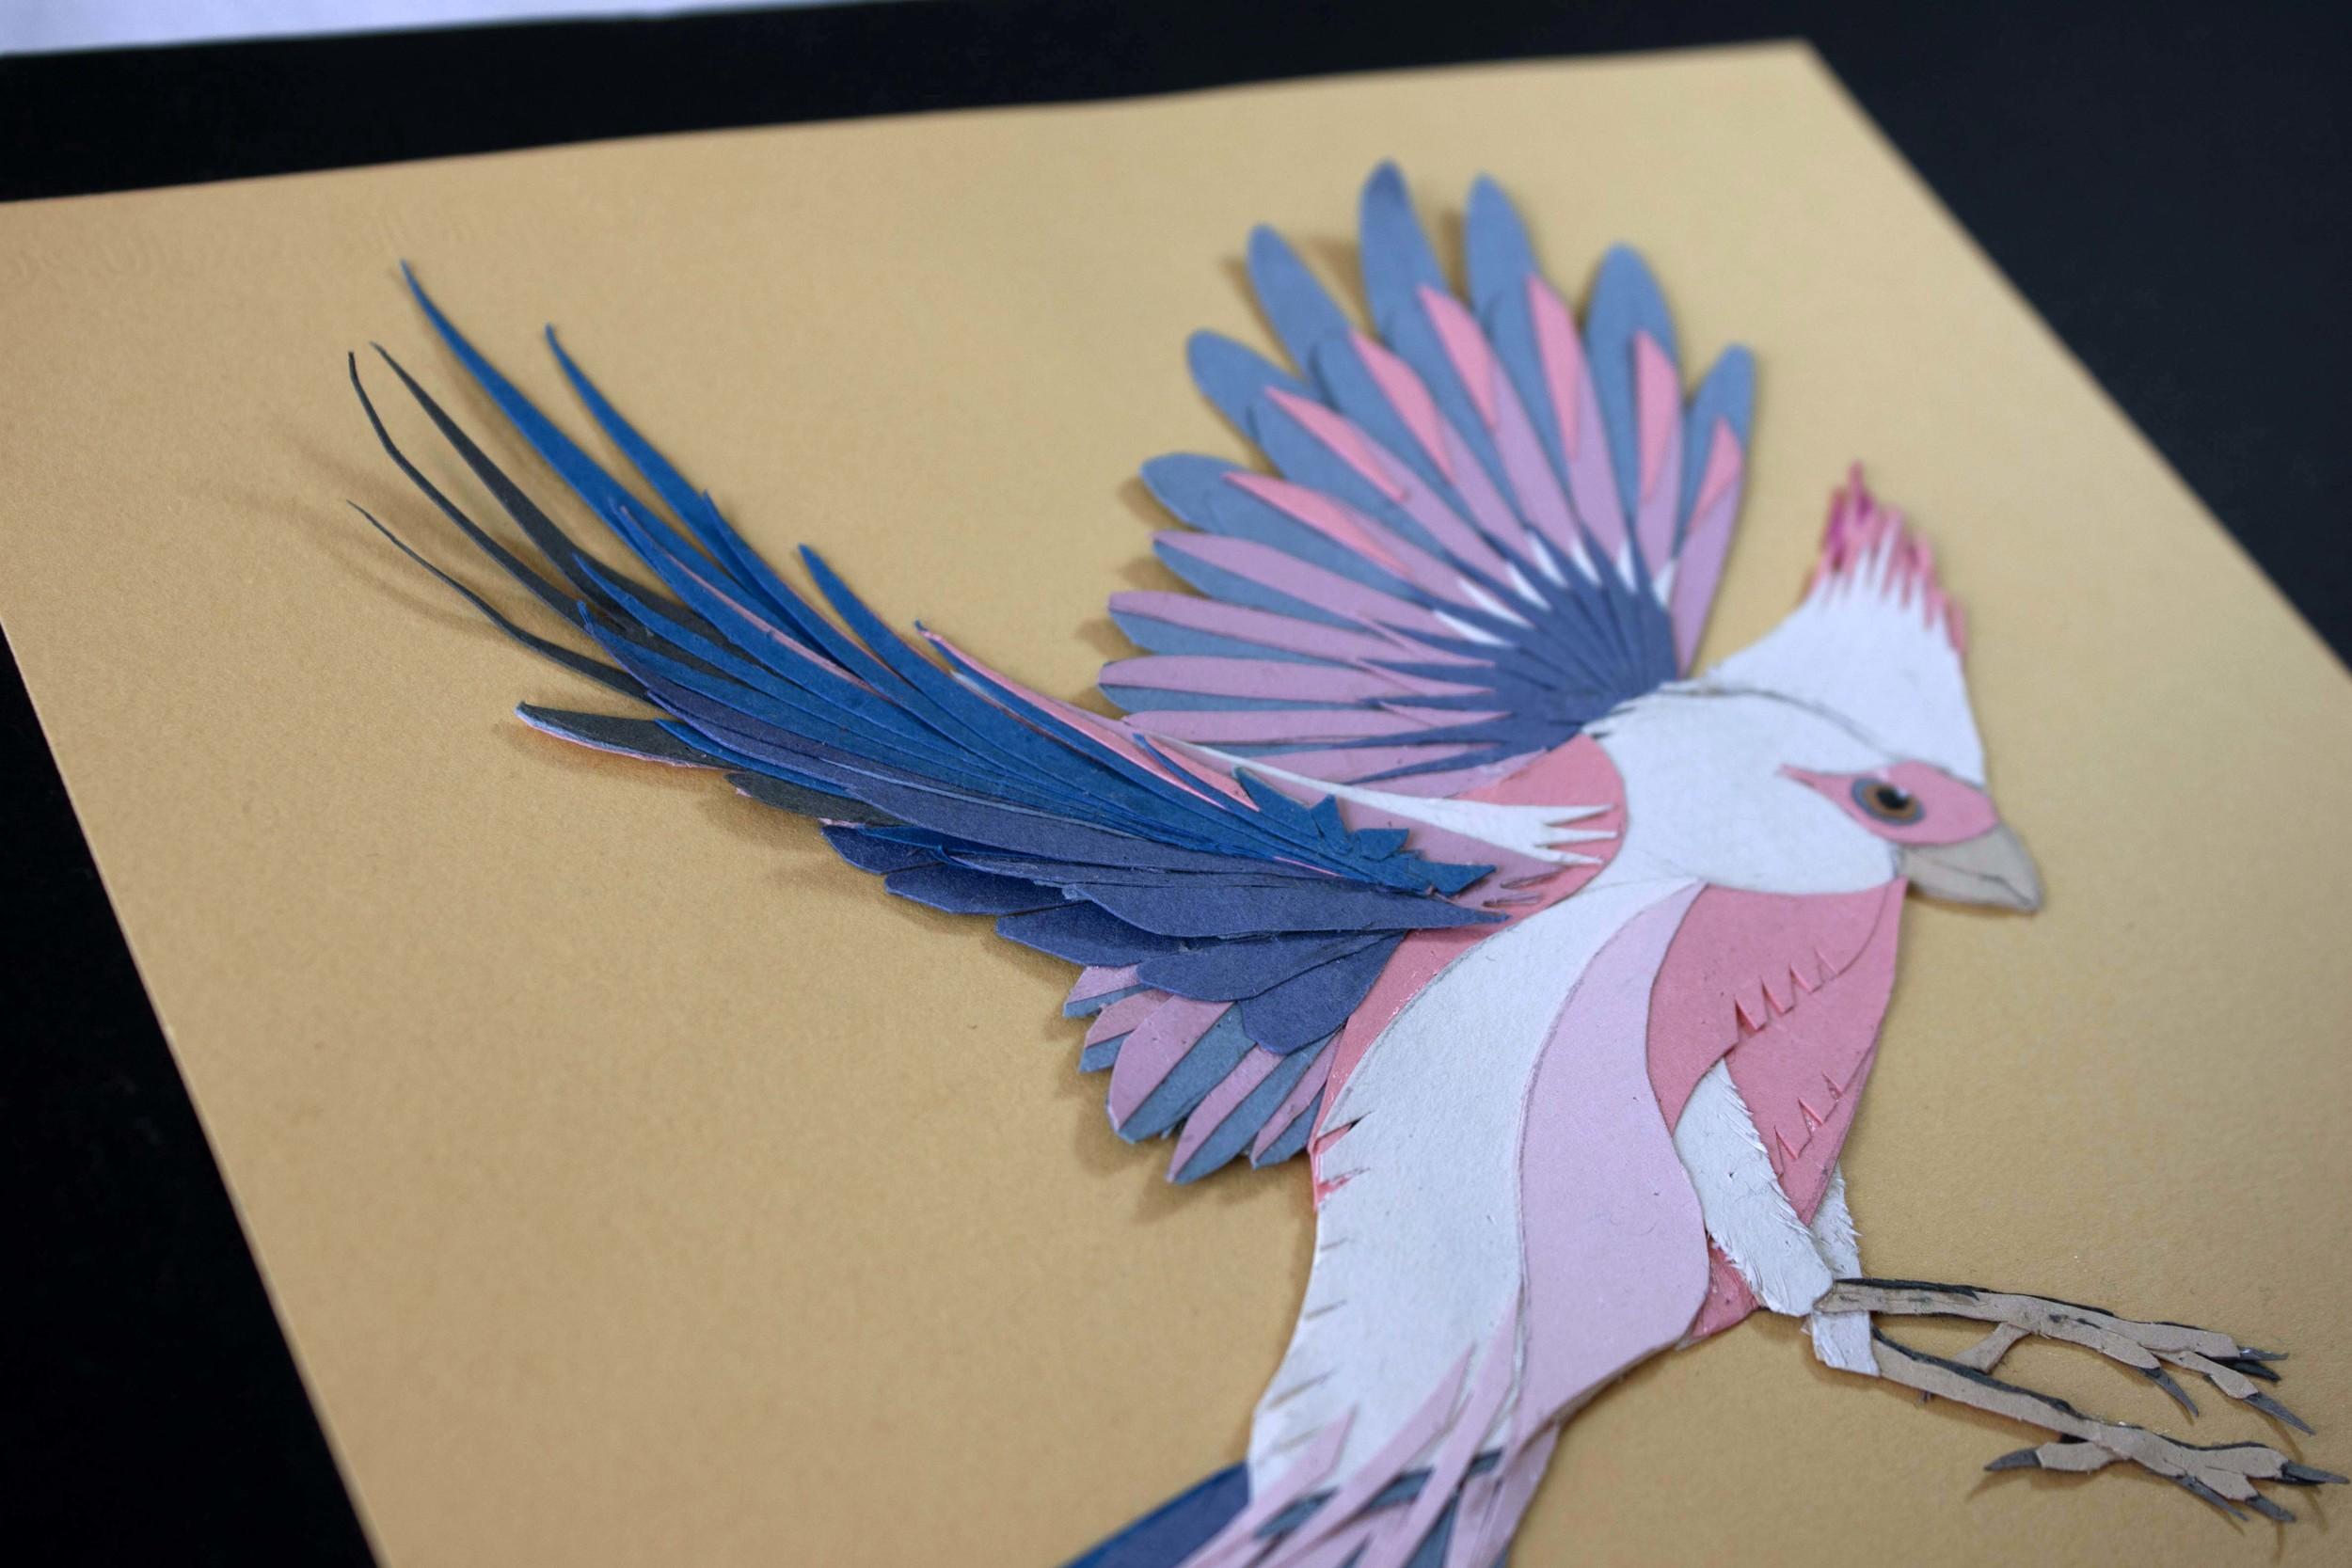 Detail of Pink and Grey Cardinal